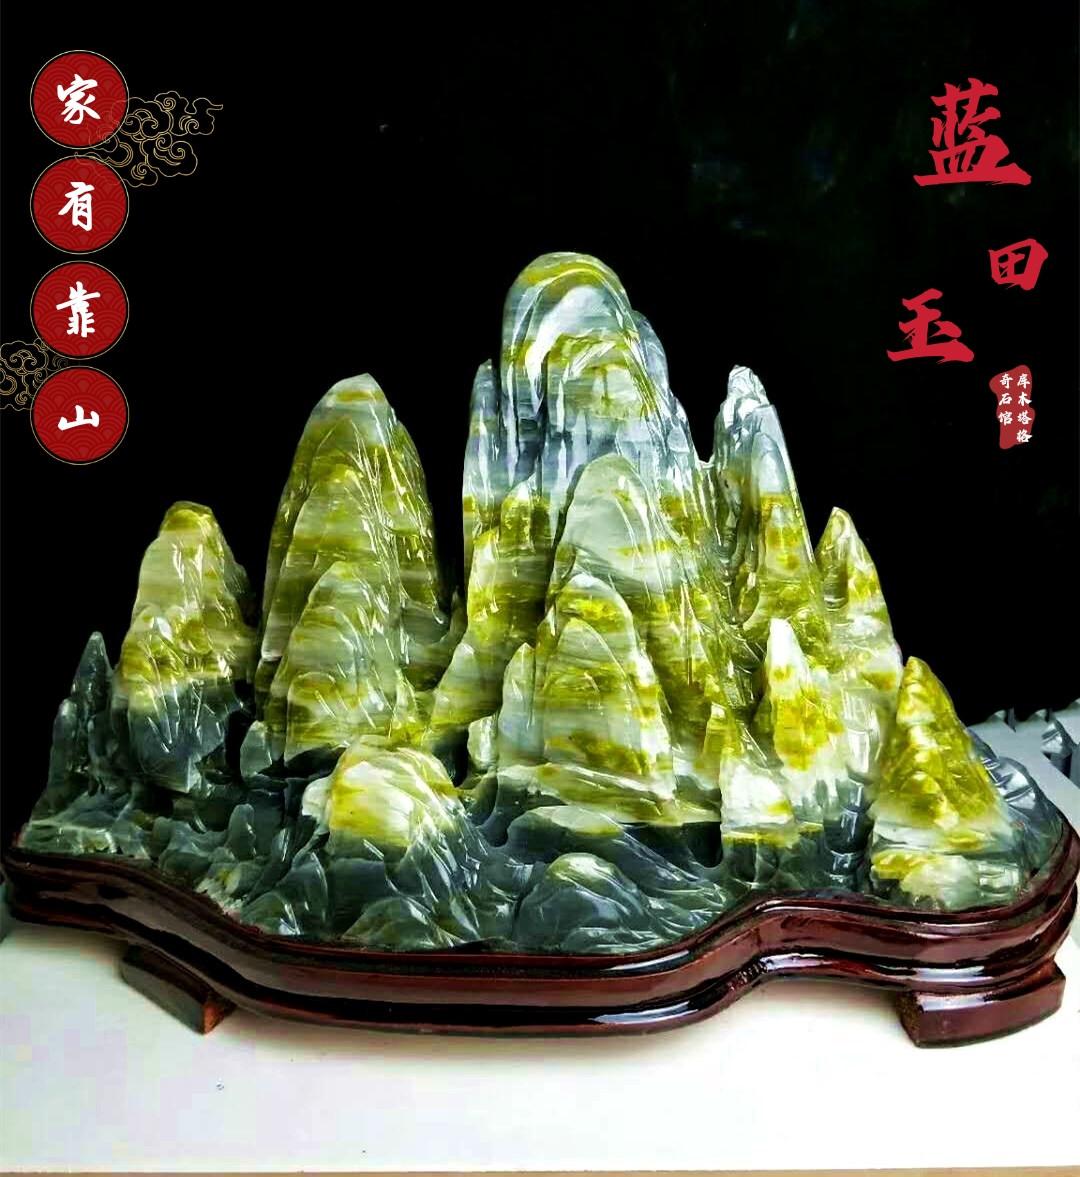 Коллекции китайской партии Артикул 527653934898